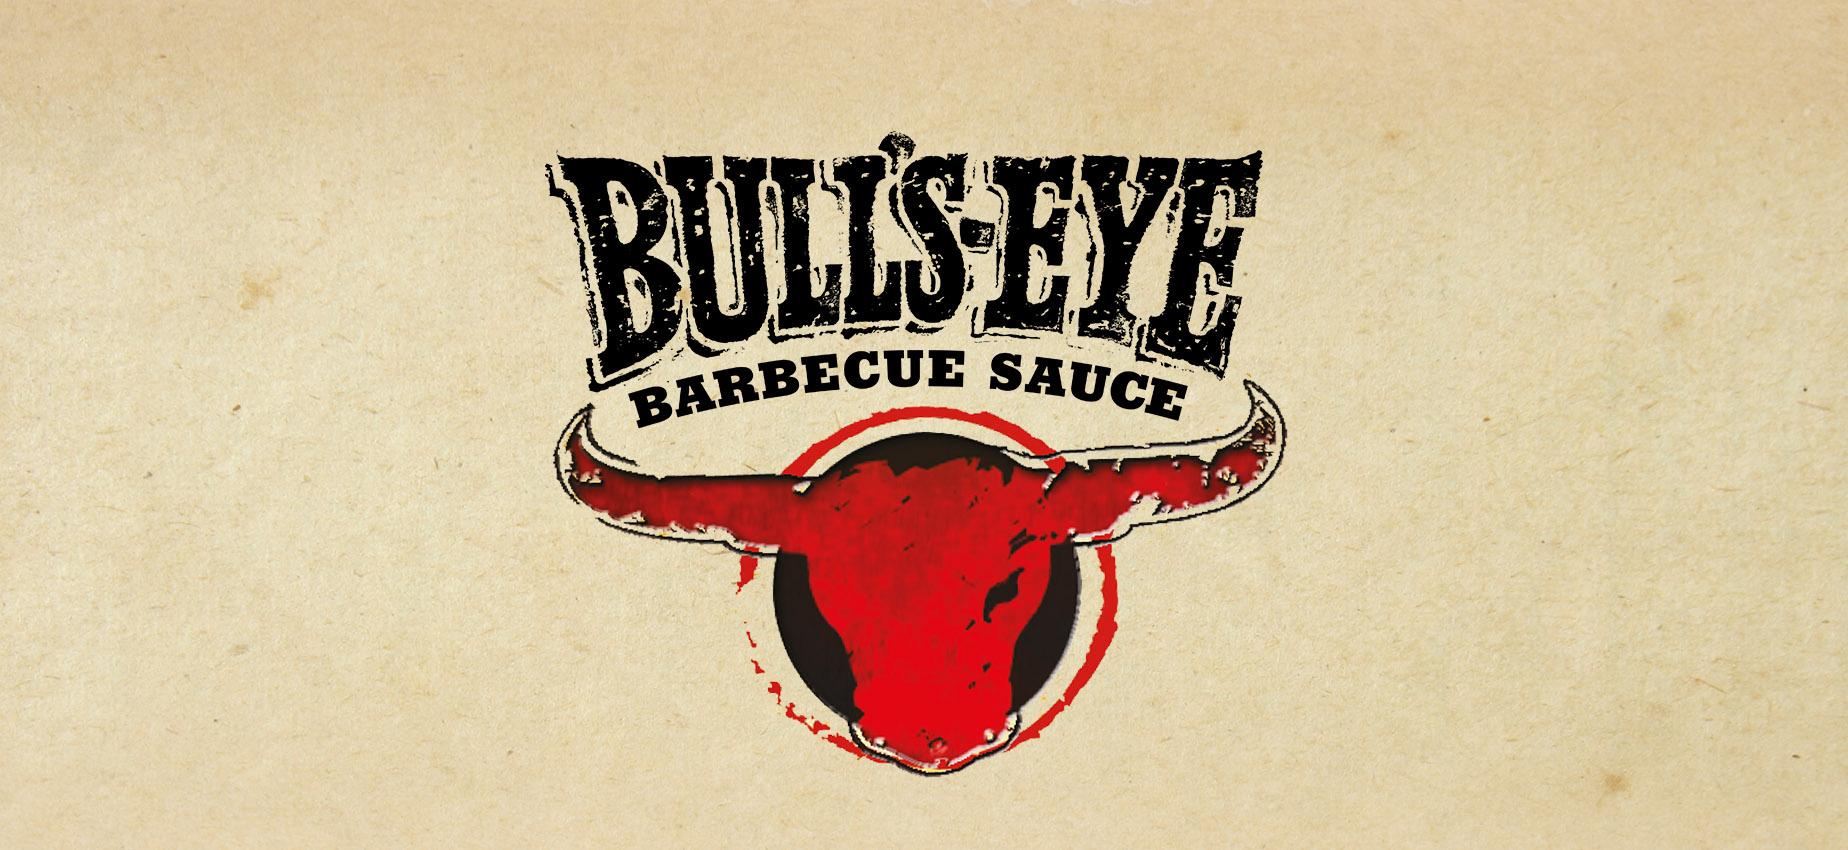 Bull's eye barbecue sauce coupon 2018